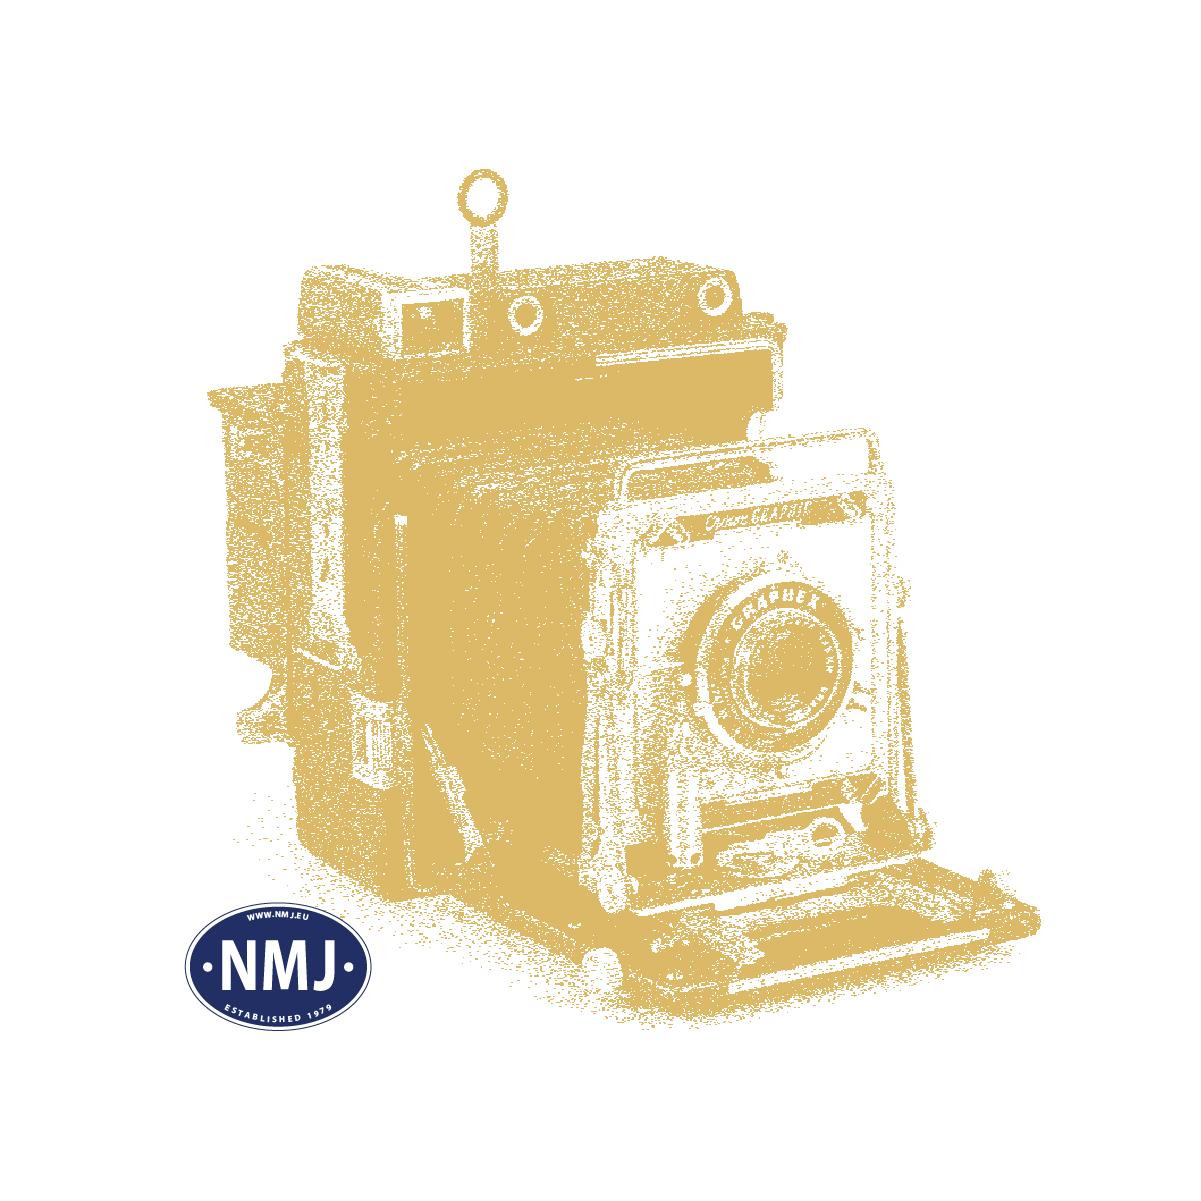 NMJT145301 - NMJ Topline CFL 1602, 0-Scale